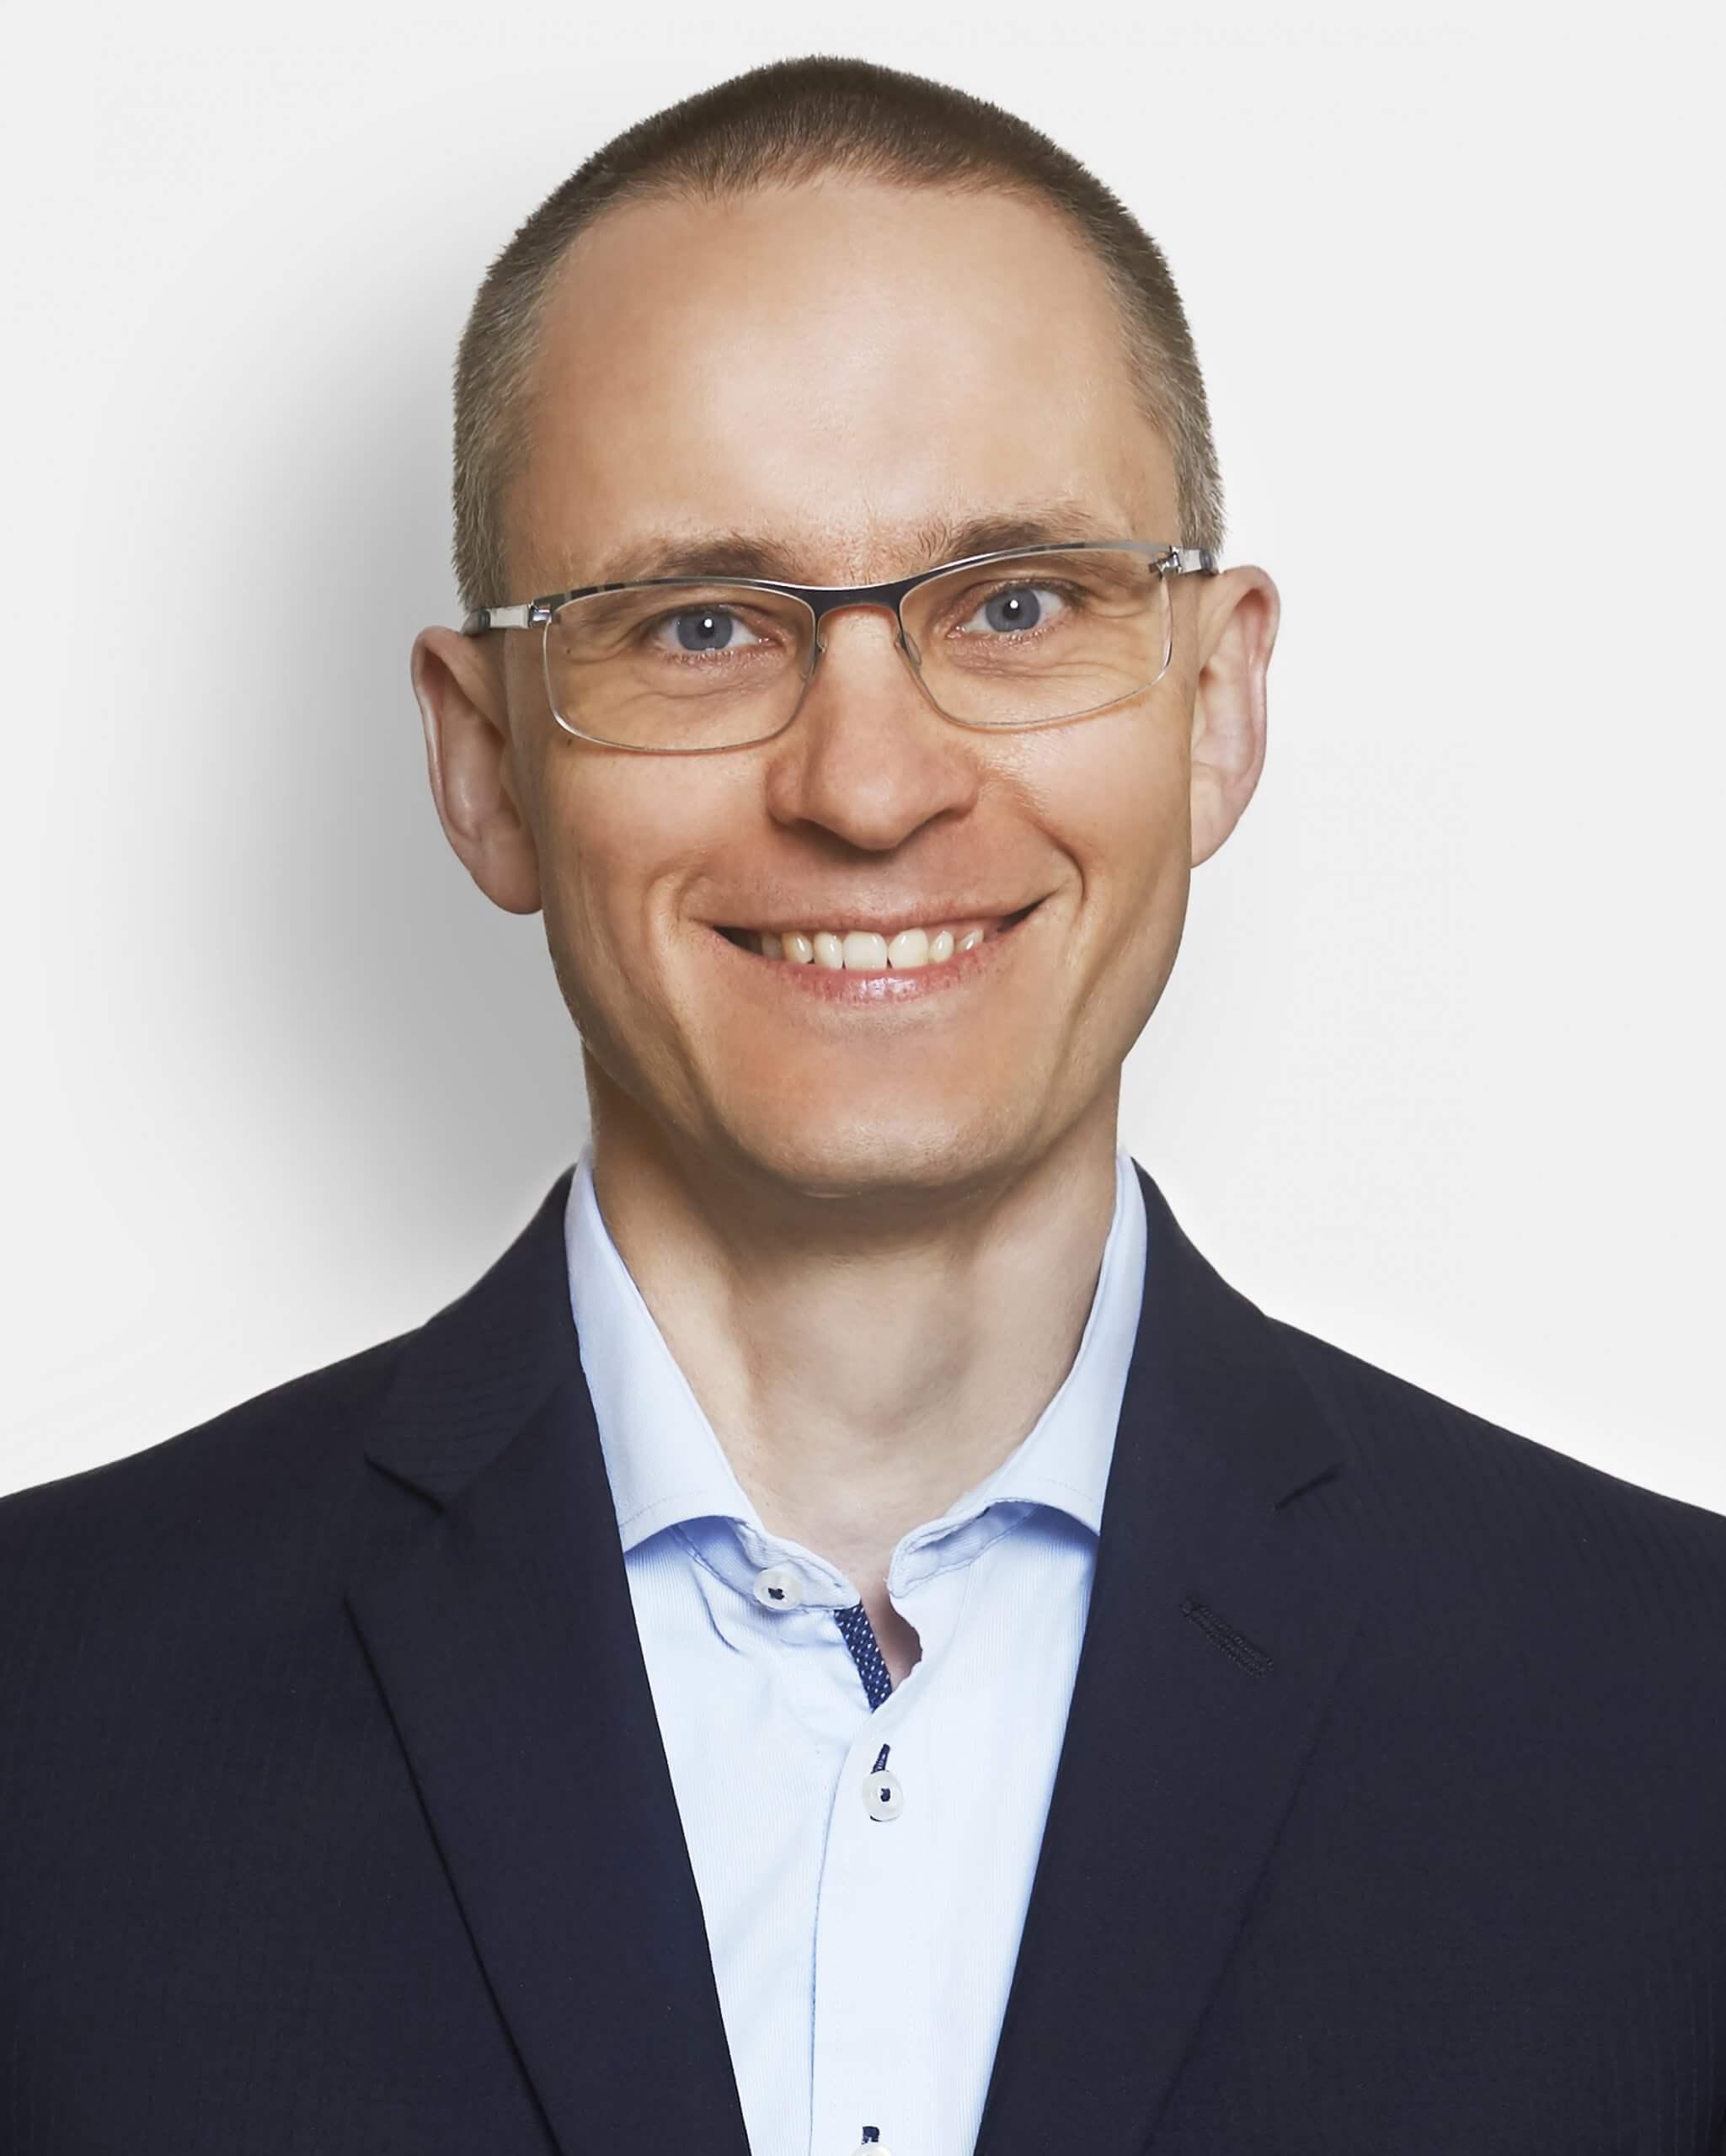 Daniel Noe Harboe